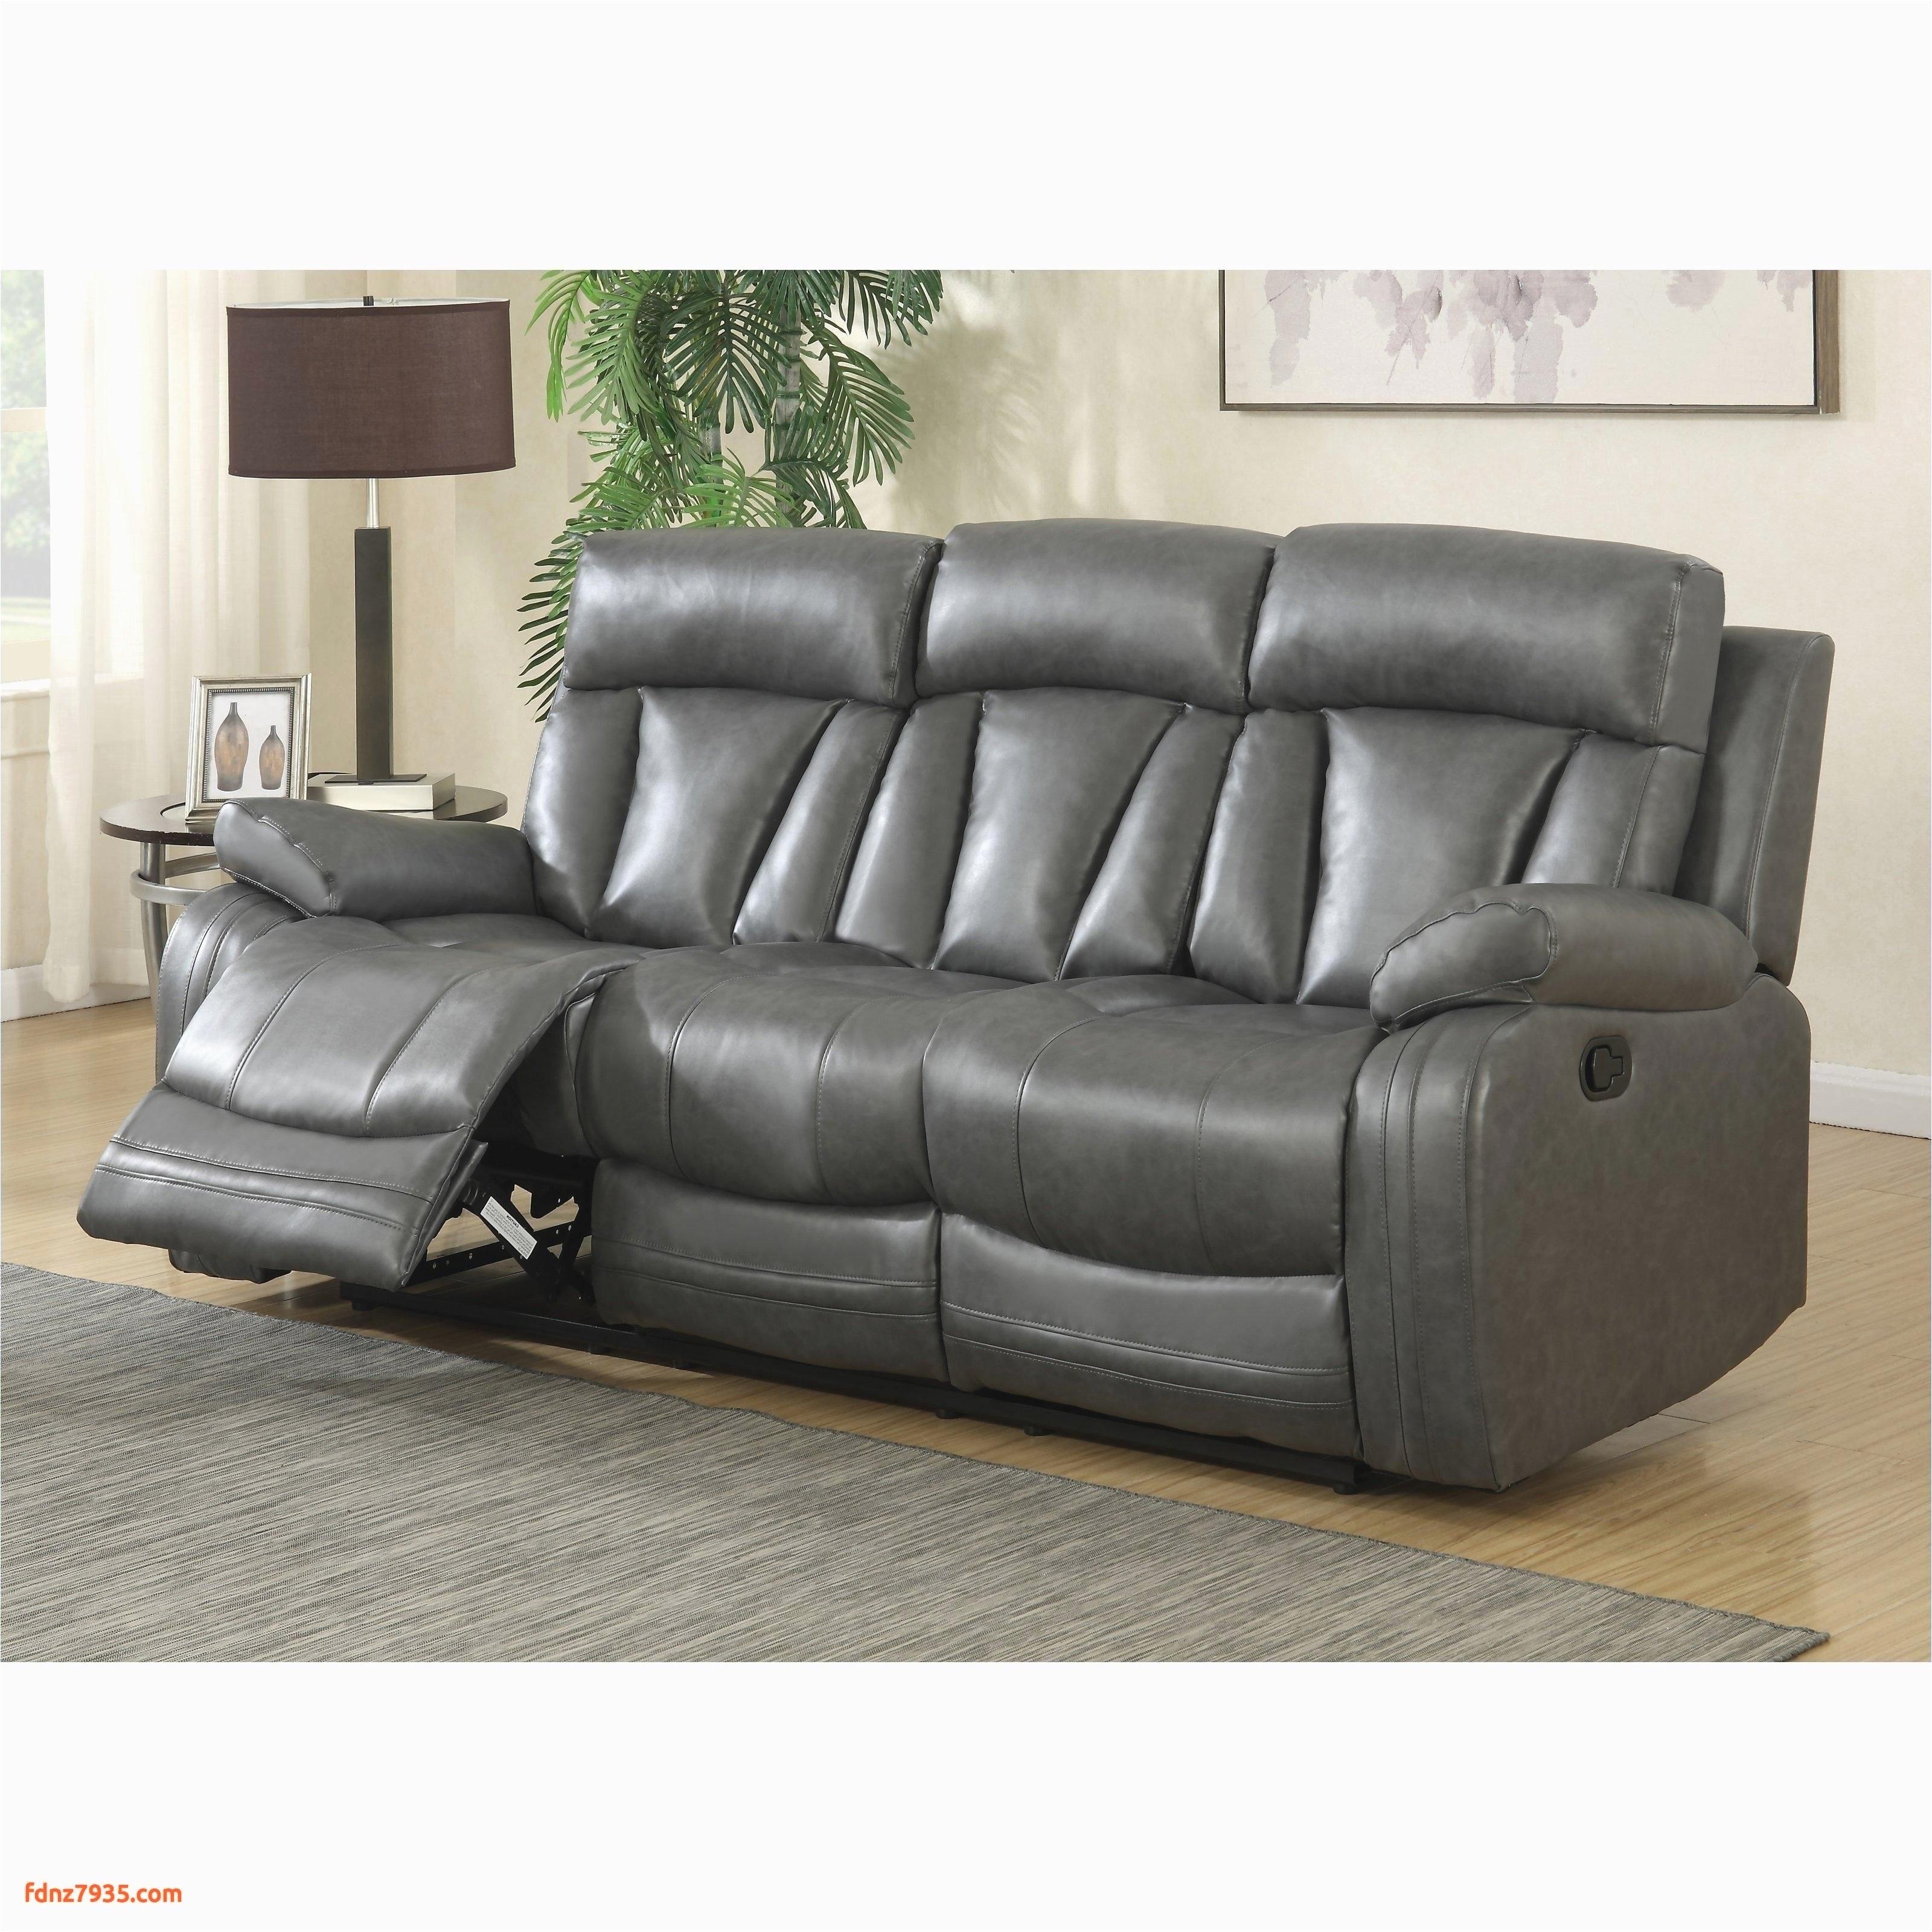 power reclining sofa and loveseat beautiful furniture gray reclining loveseat best tufted loveseat 0d bob furniture